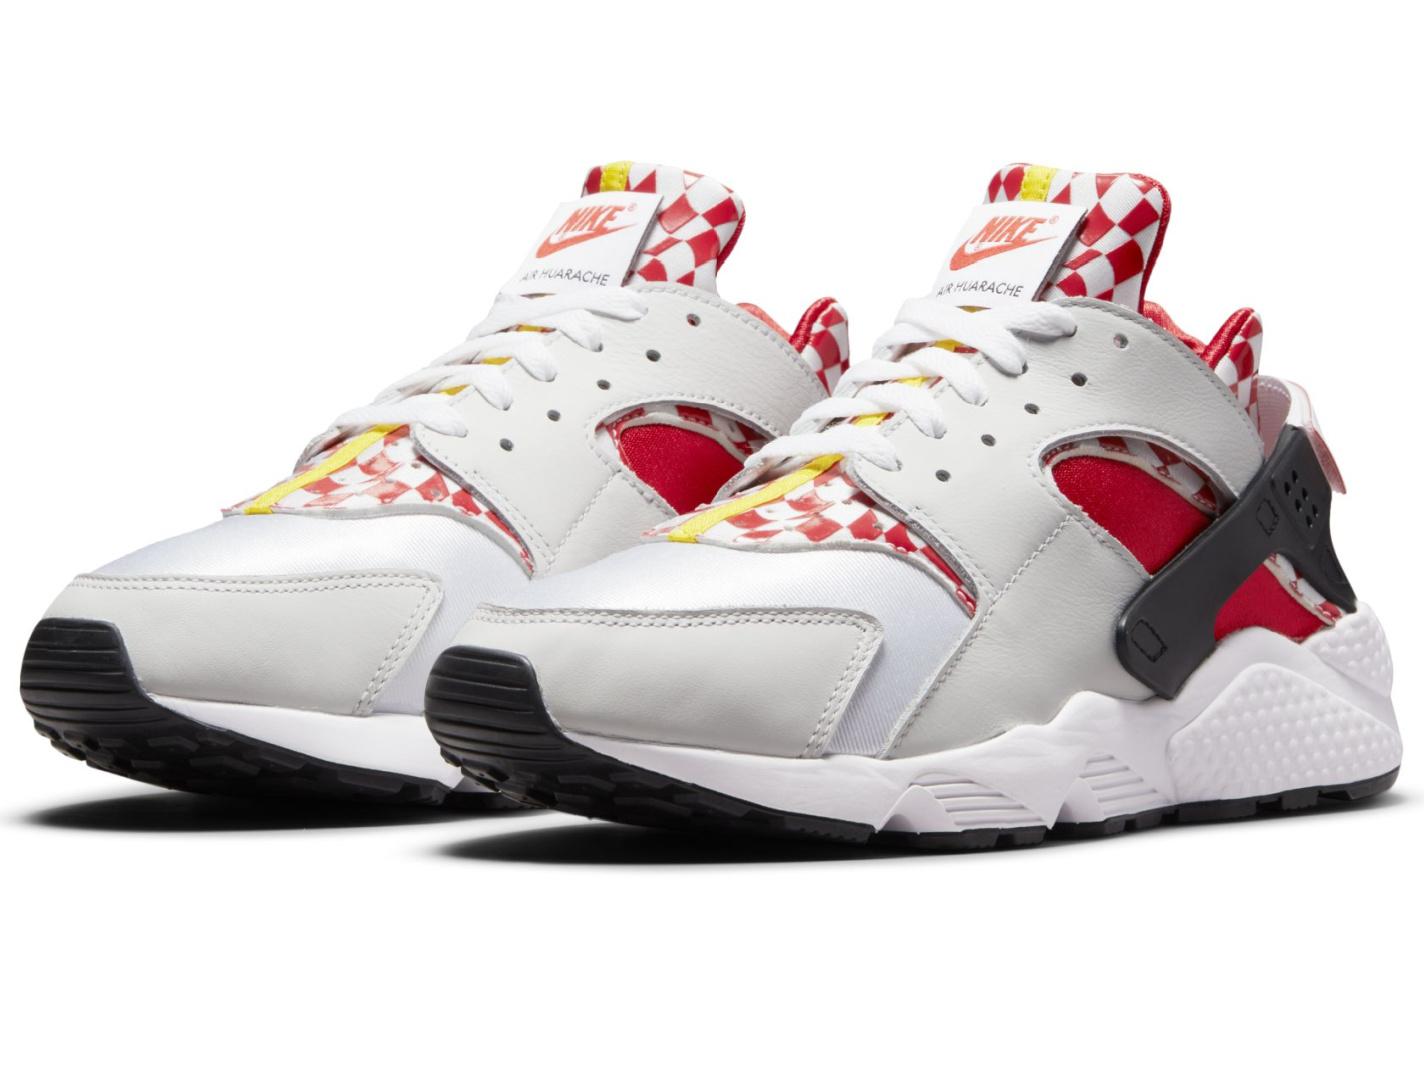 Nike X Liverpool FC Air Huarache sneakers